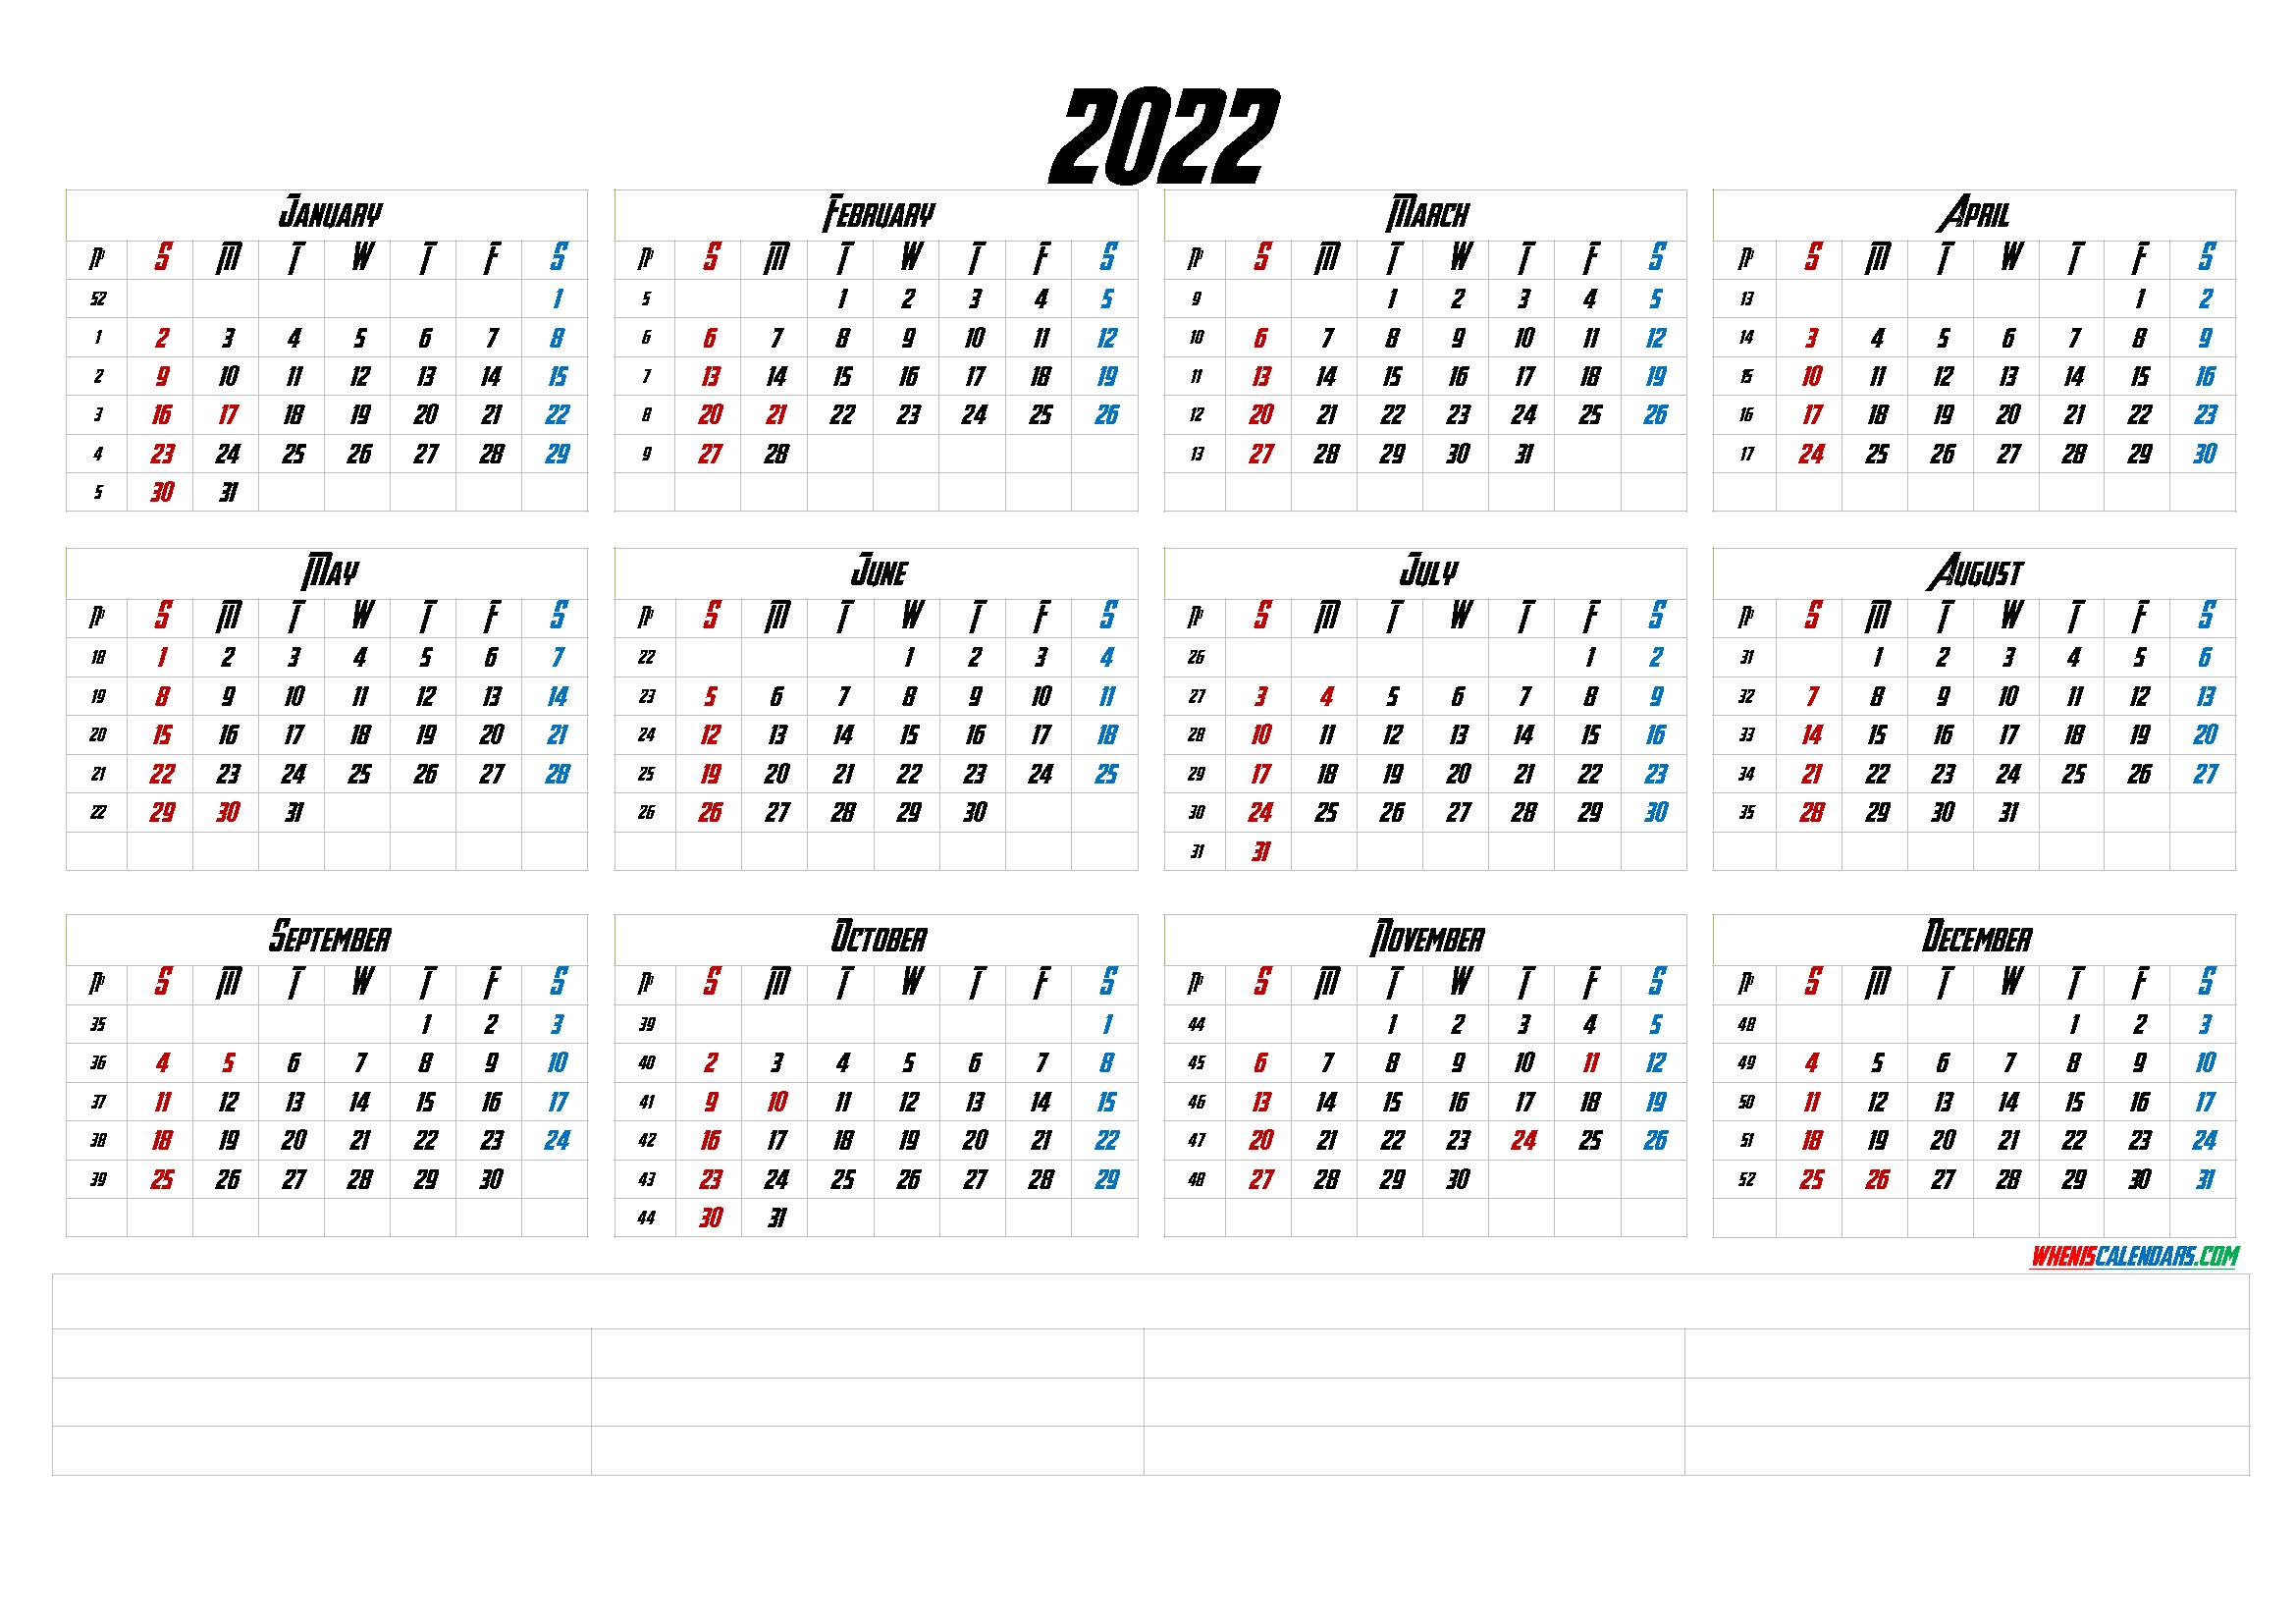 12 Month Calendar Printable 2022 (6 Templates) - Free